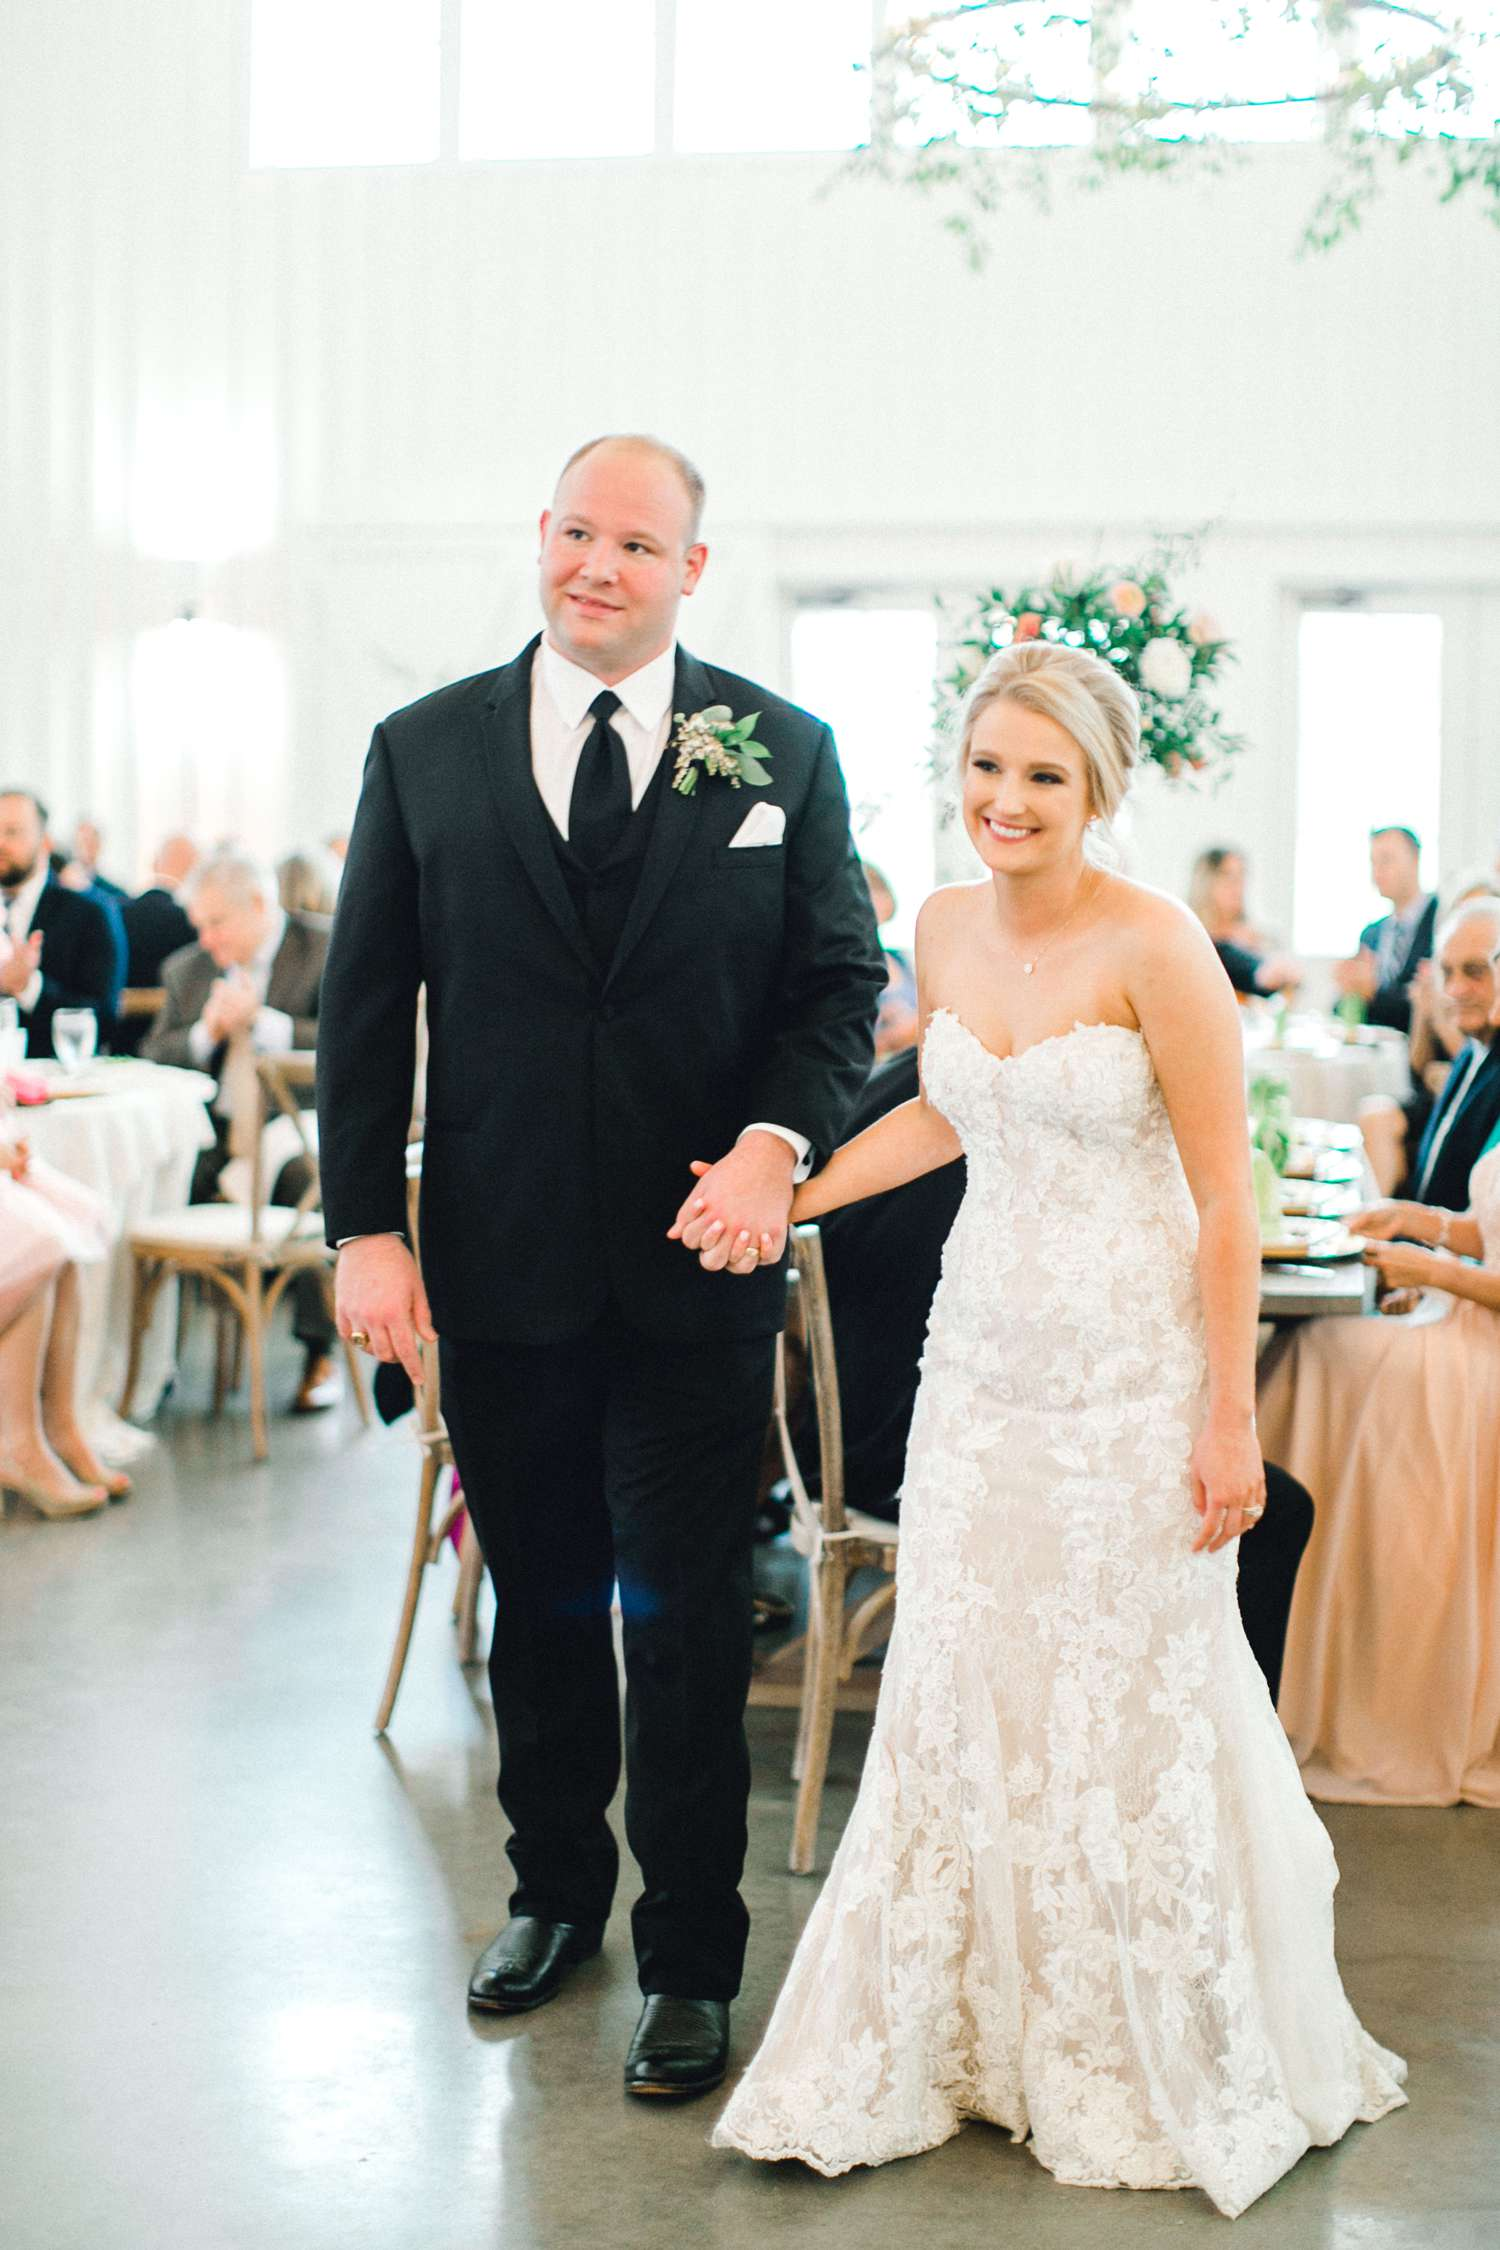 HEBERT_MORGAN_AND_CLAY_ALLEEJ_THE_FARMHOUSE_MONTGOMERY_TEXAS_WEDDING_0186.jpg